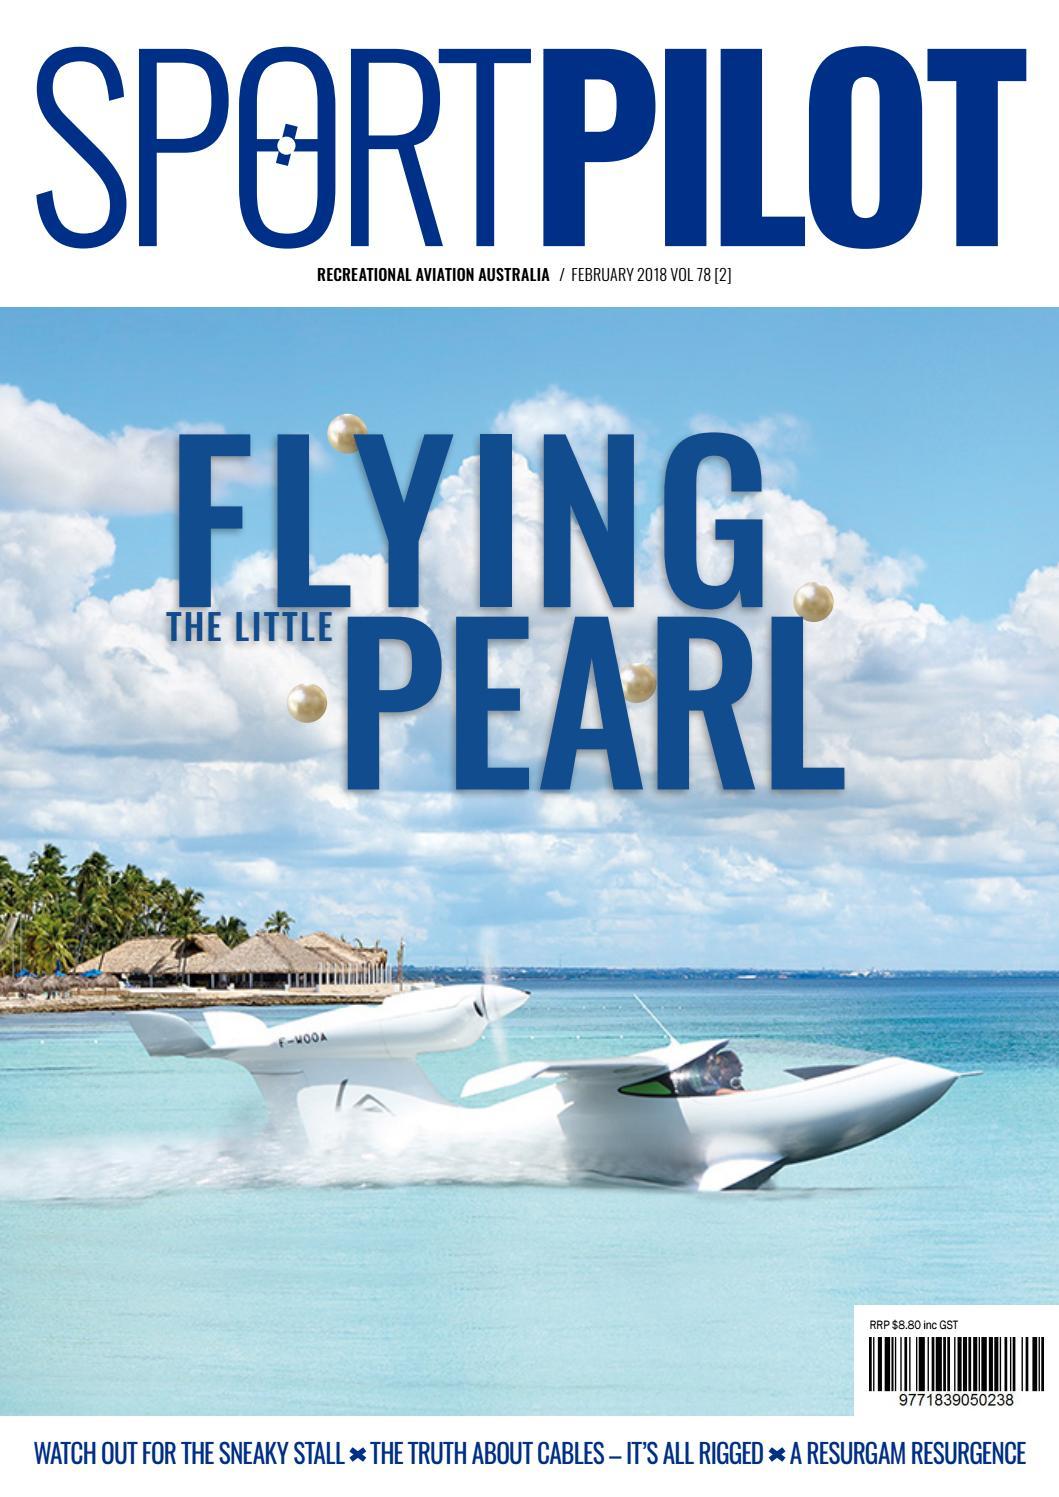 Sport pilot 78 feb 2018 by Recreational Aviation Australia